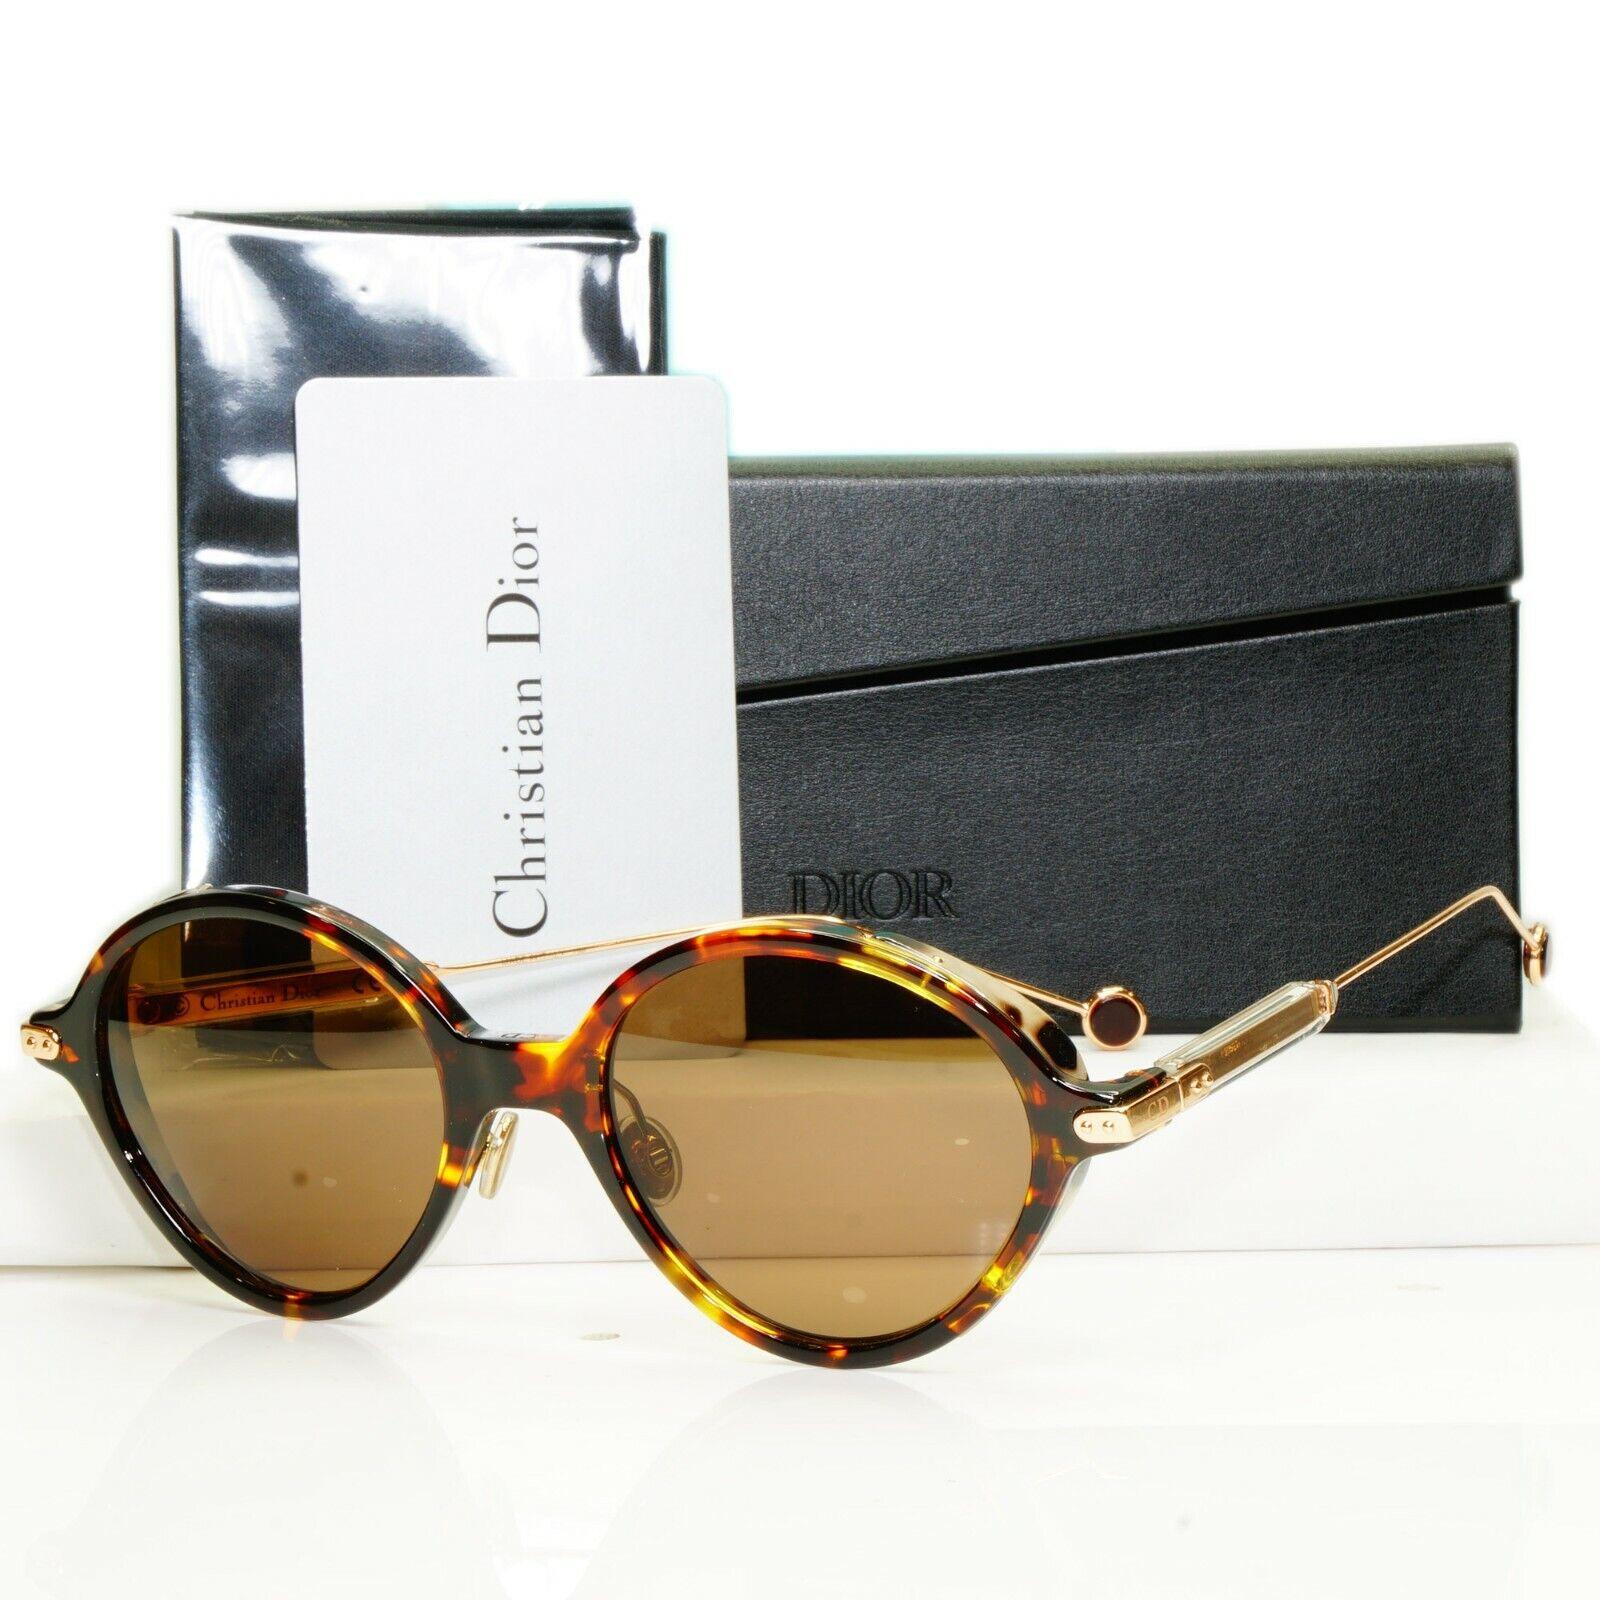 Authentic Dior Womens Sunglasses Round Umbrage Havana Brown N3 Gold 0X3TN